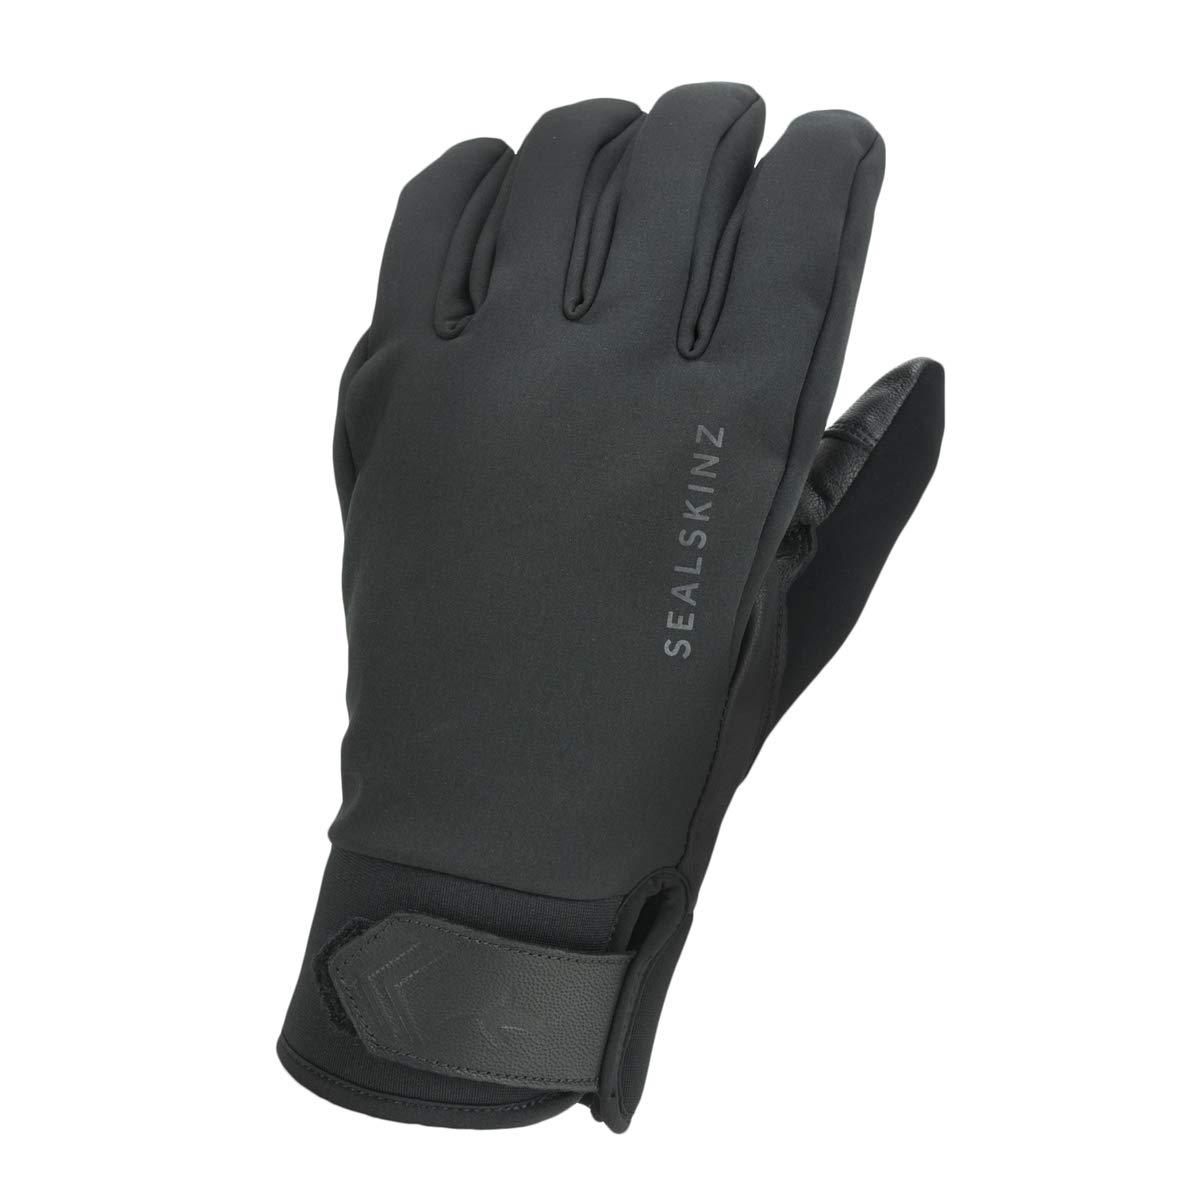 SealSkinz All Season 100/% Waterproof Outdoor Hiking Walking Work Gloves Black